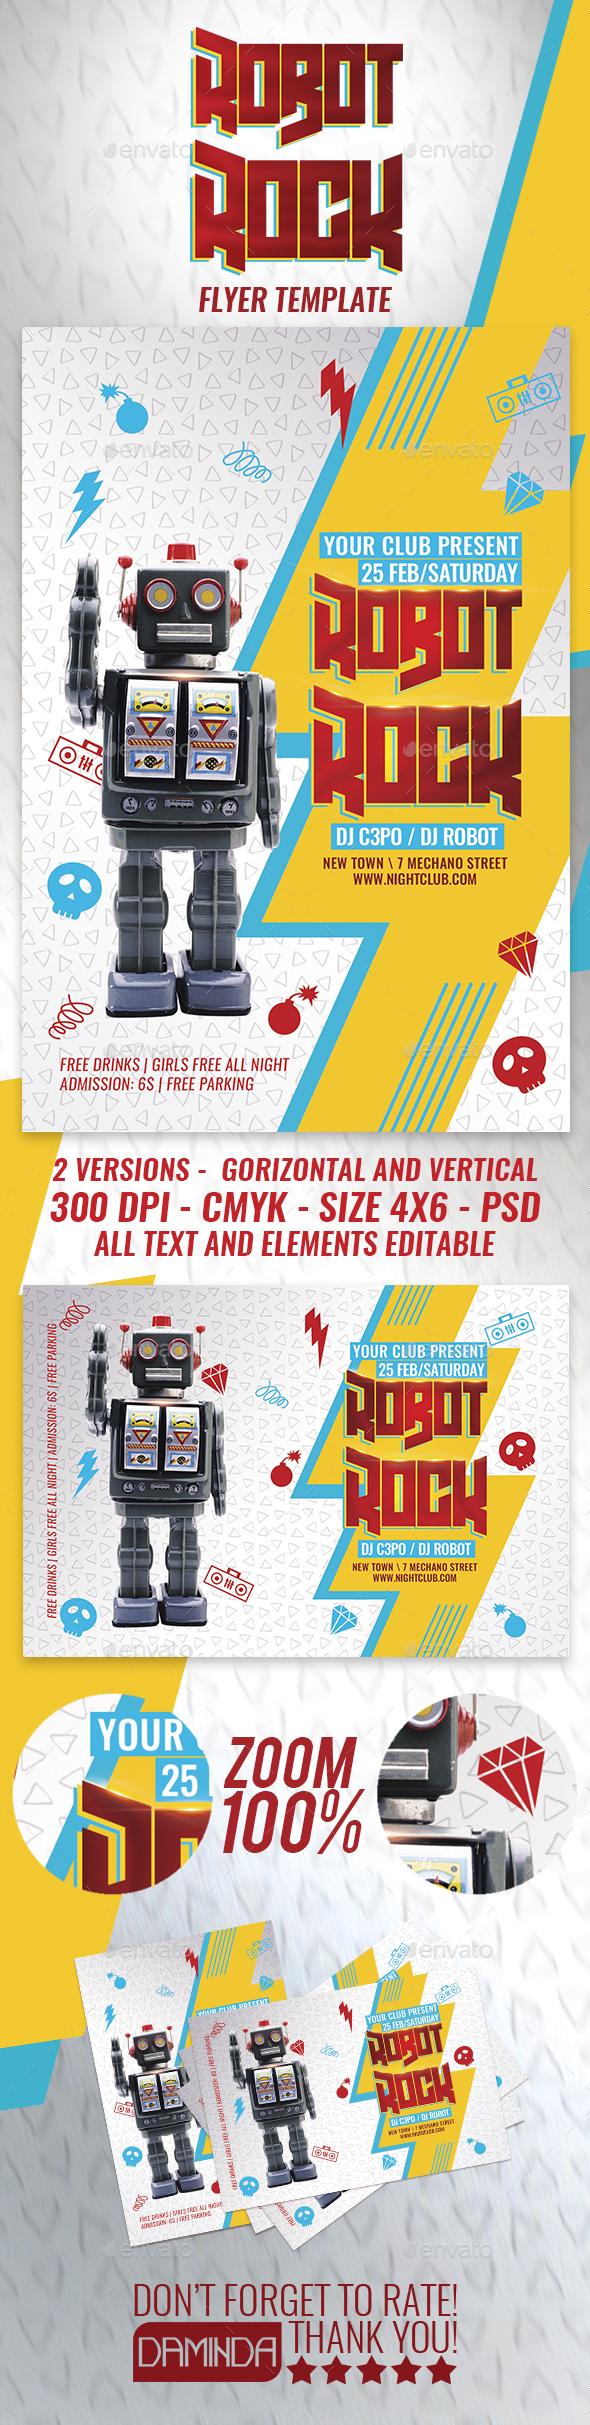 Robot Rock Flyer Template - Clubs & Parties Events